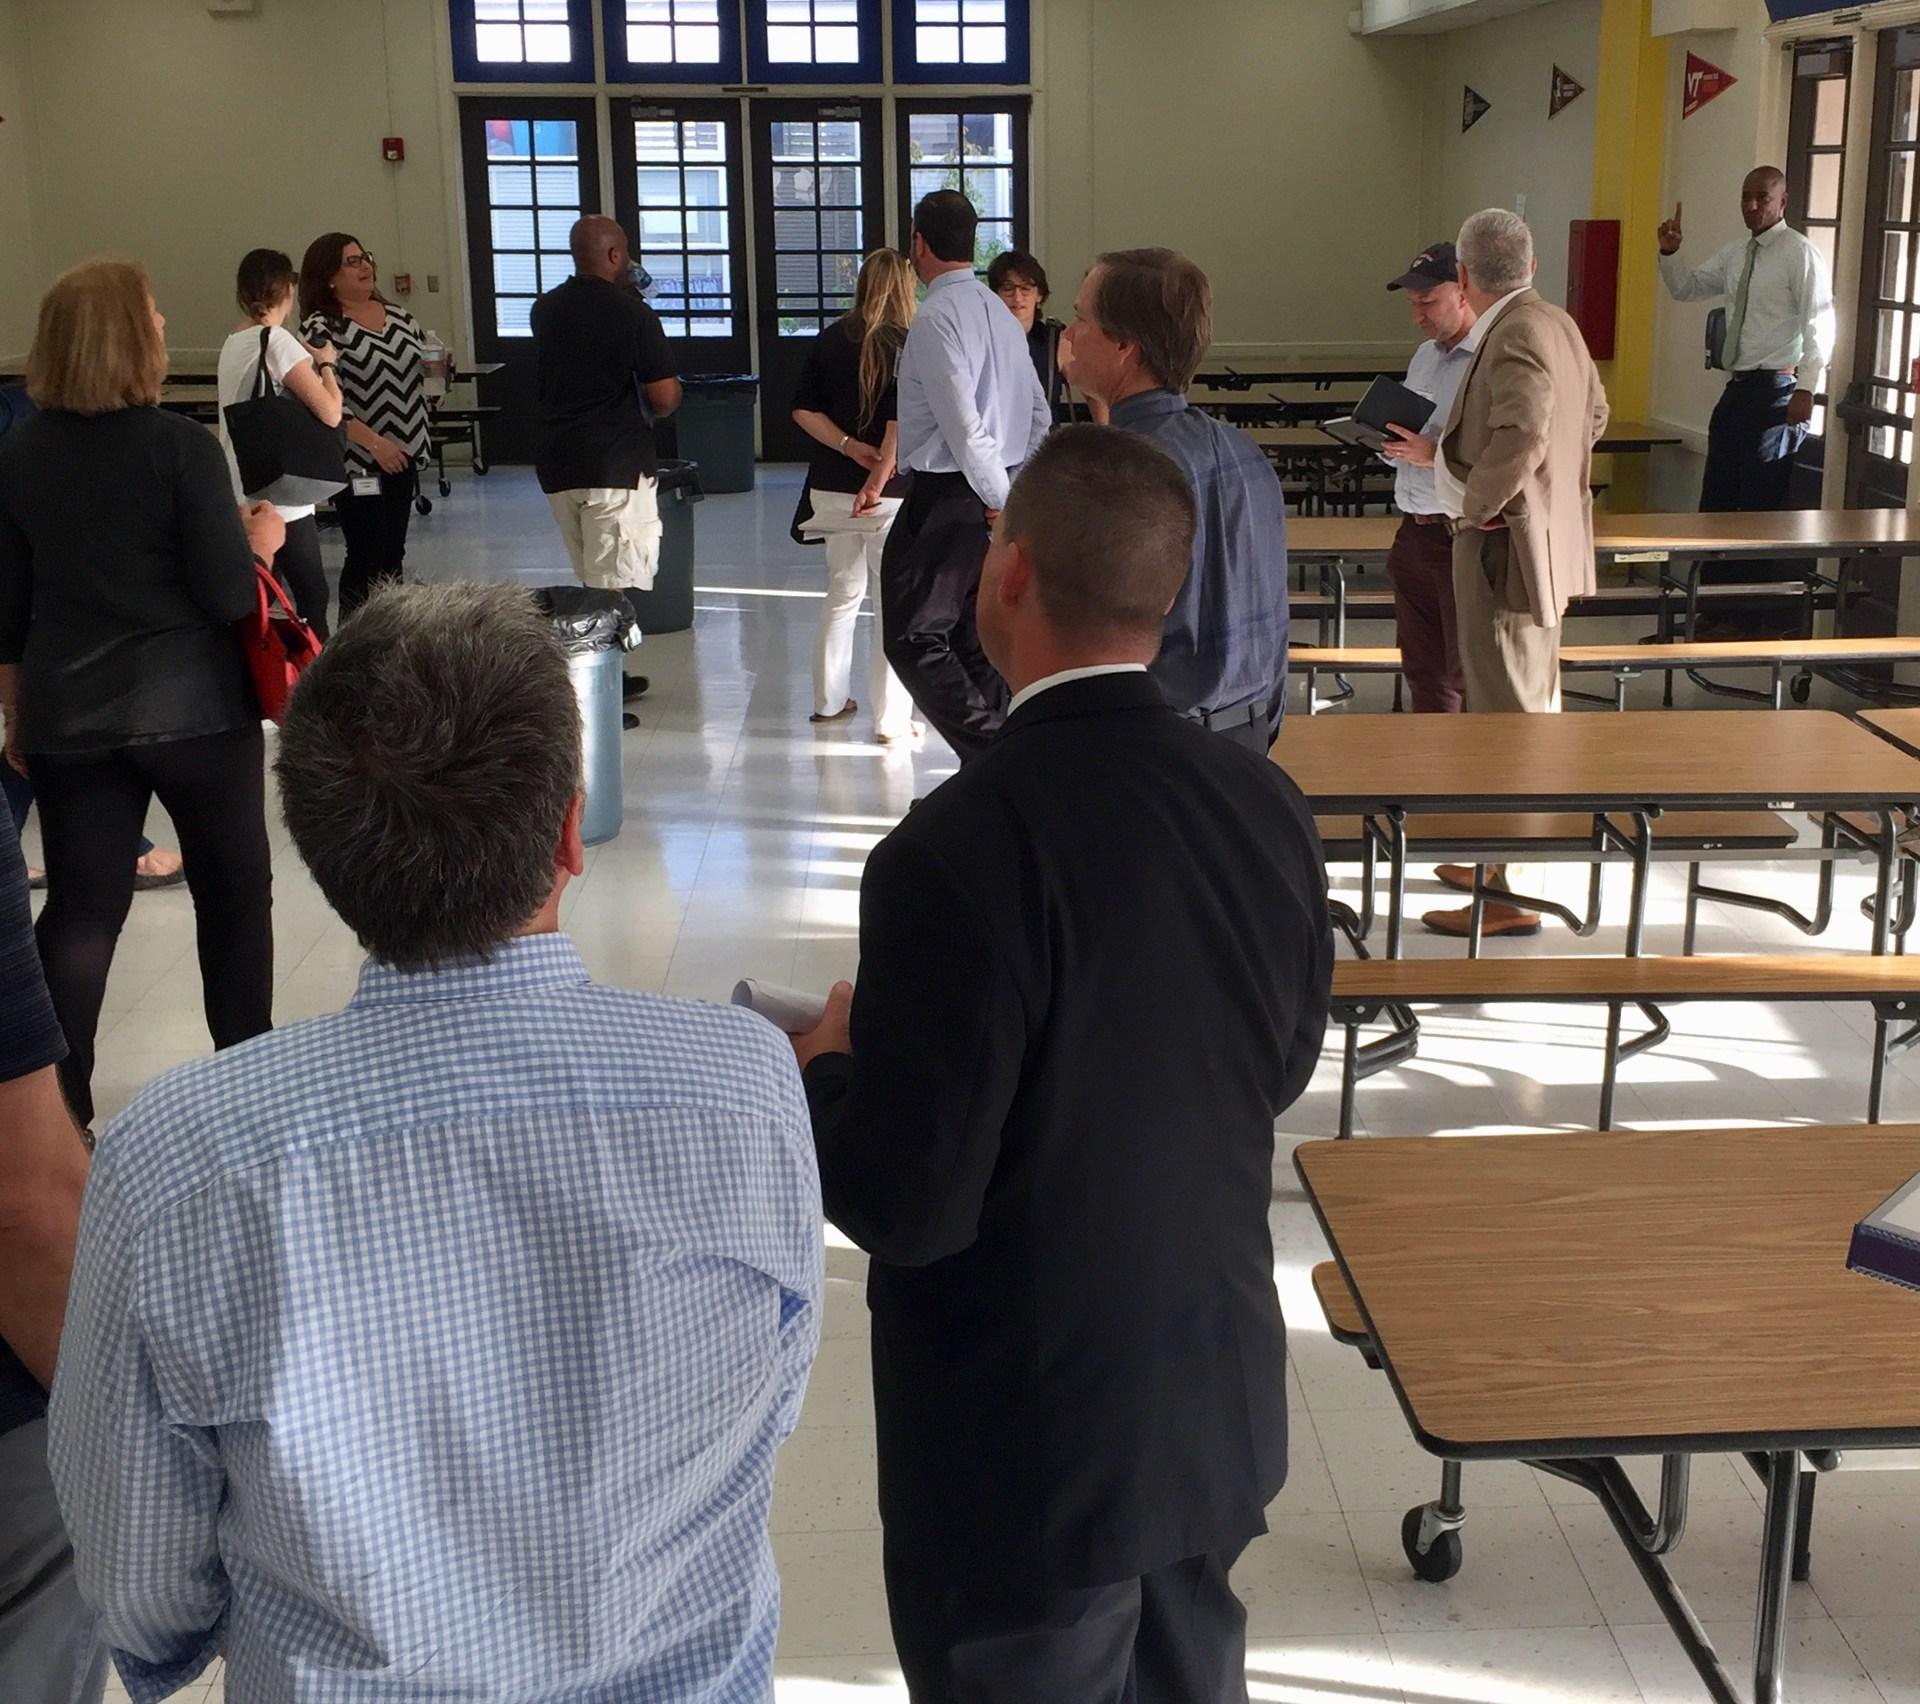 Hawthorne School Interim Principal Richard Waters leads a campus tour of the Future Focused Schools Team on 10/3/17